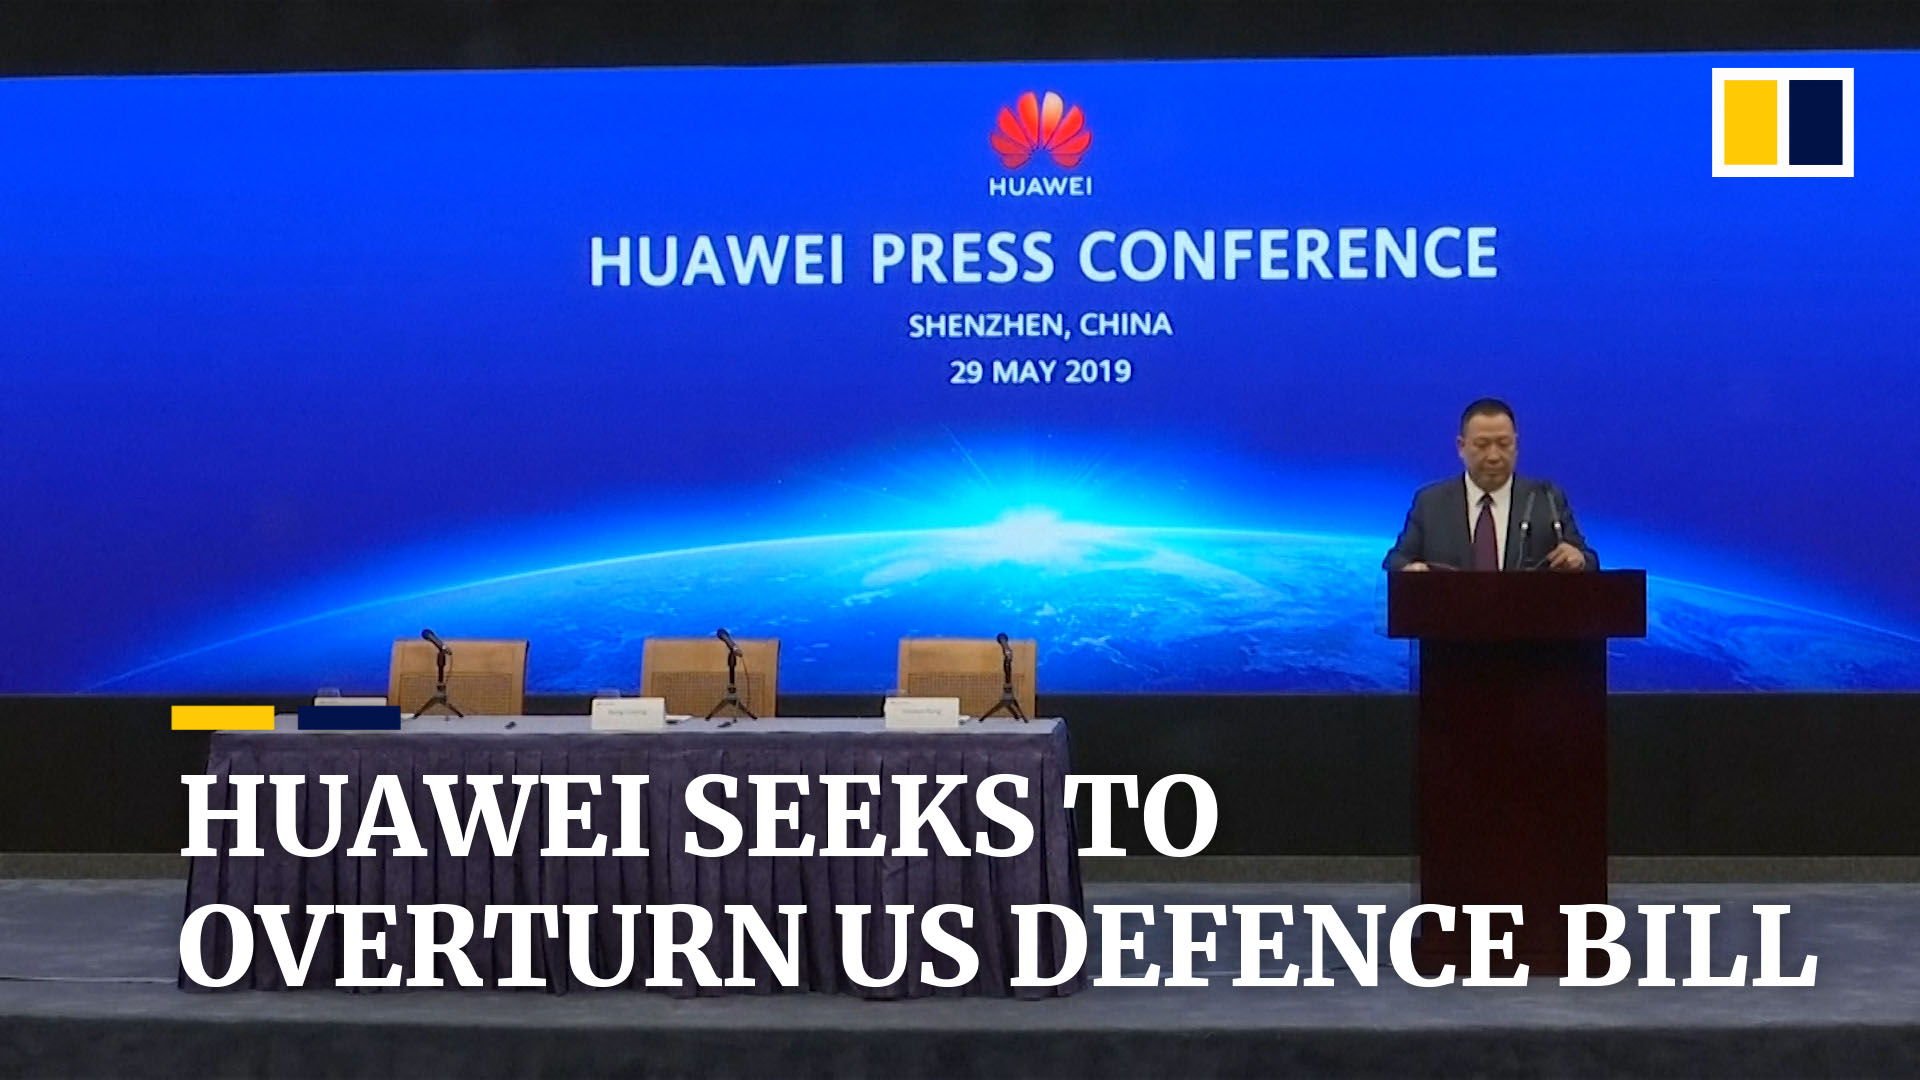 Malaysia's Mahathir backs Huawei, snubbing US blacklist of